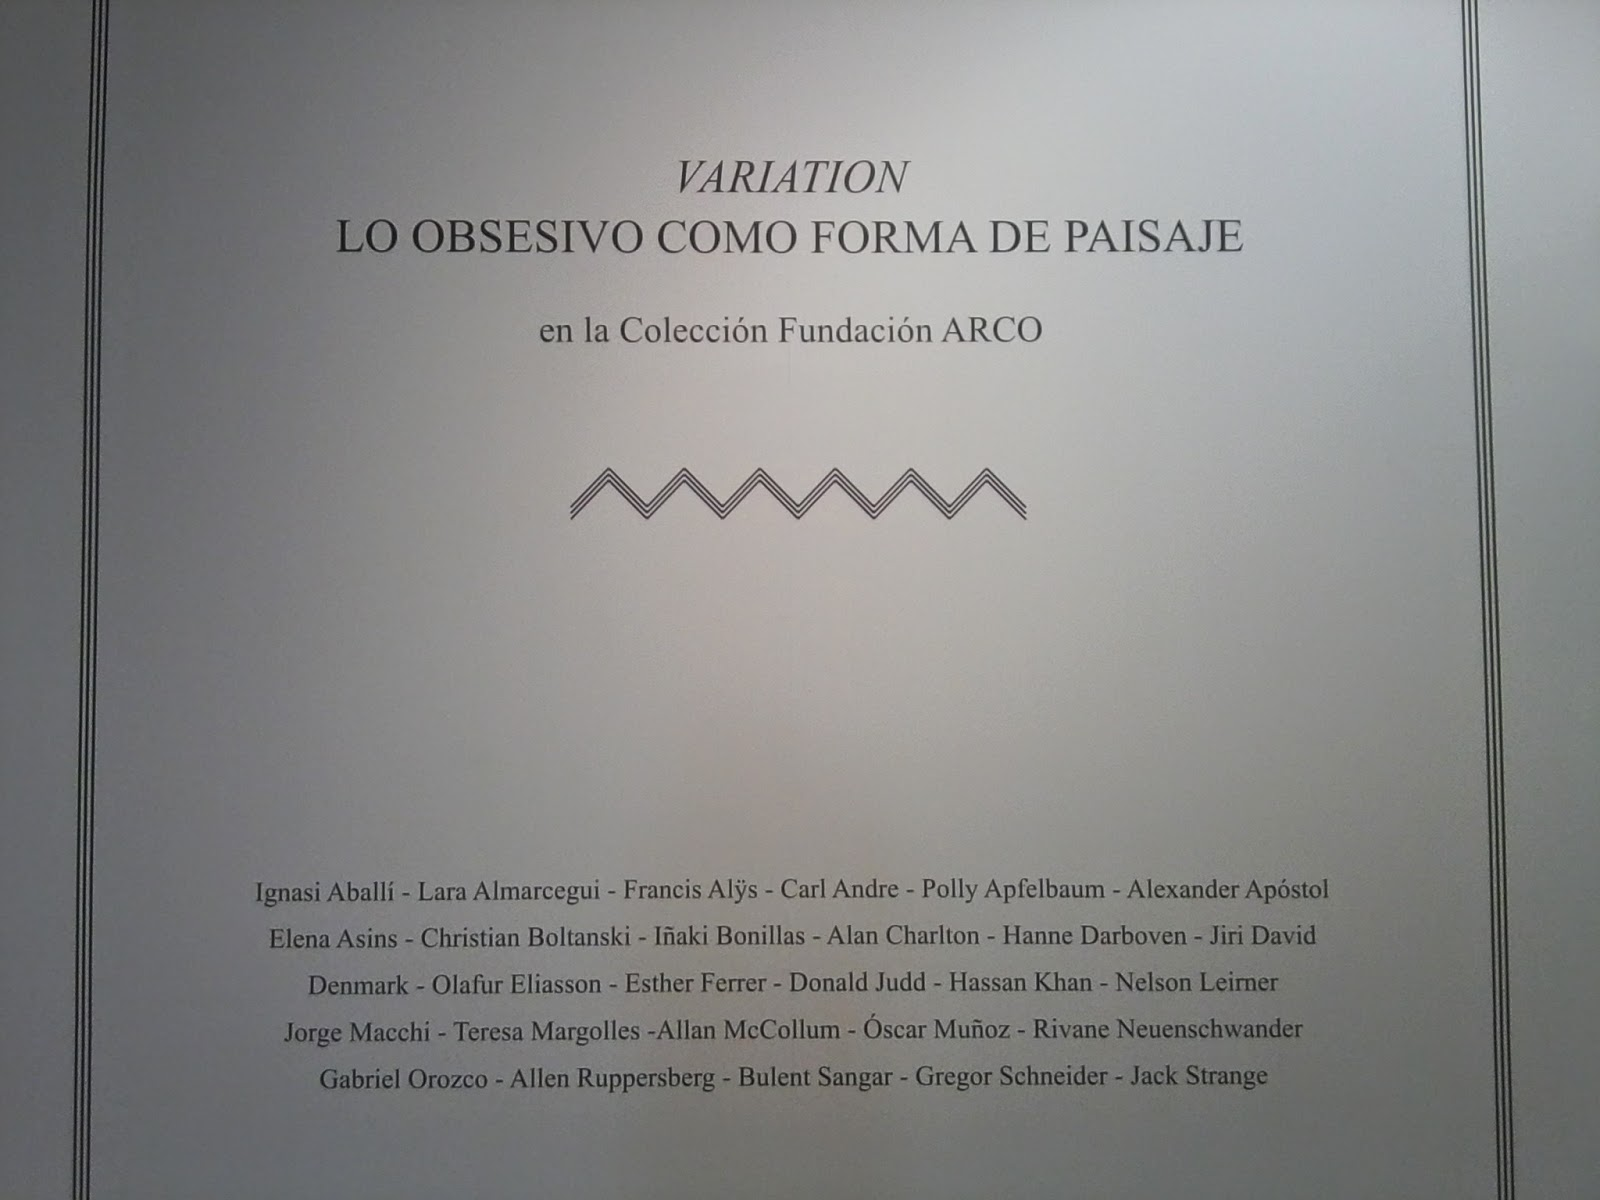 Blog de Arte, Voa-Gallery, Fundación ARCO, Colección, fotografía, Centro de Arte Alcobendas, Exposición temporal, Variation, Instalación,